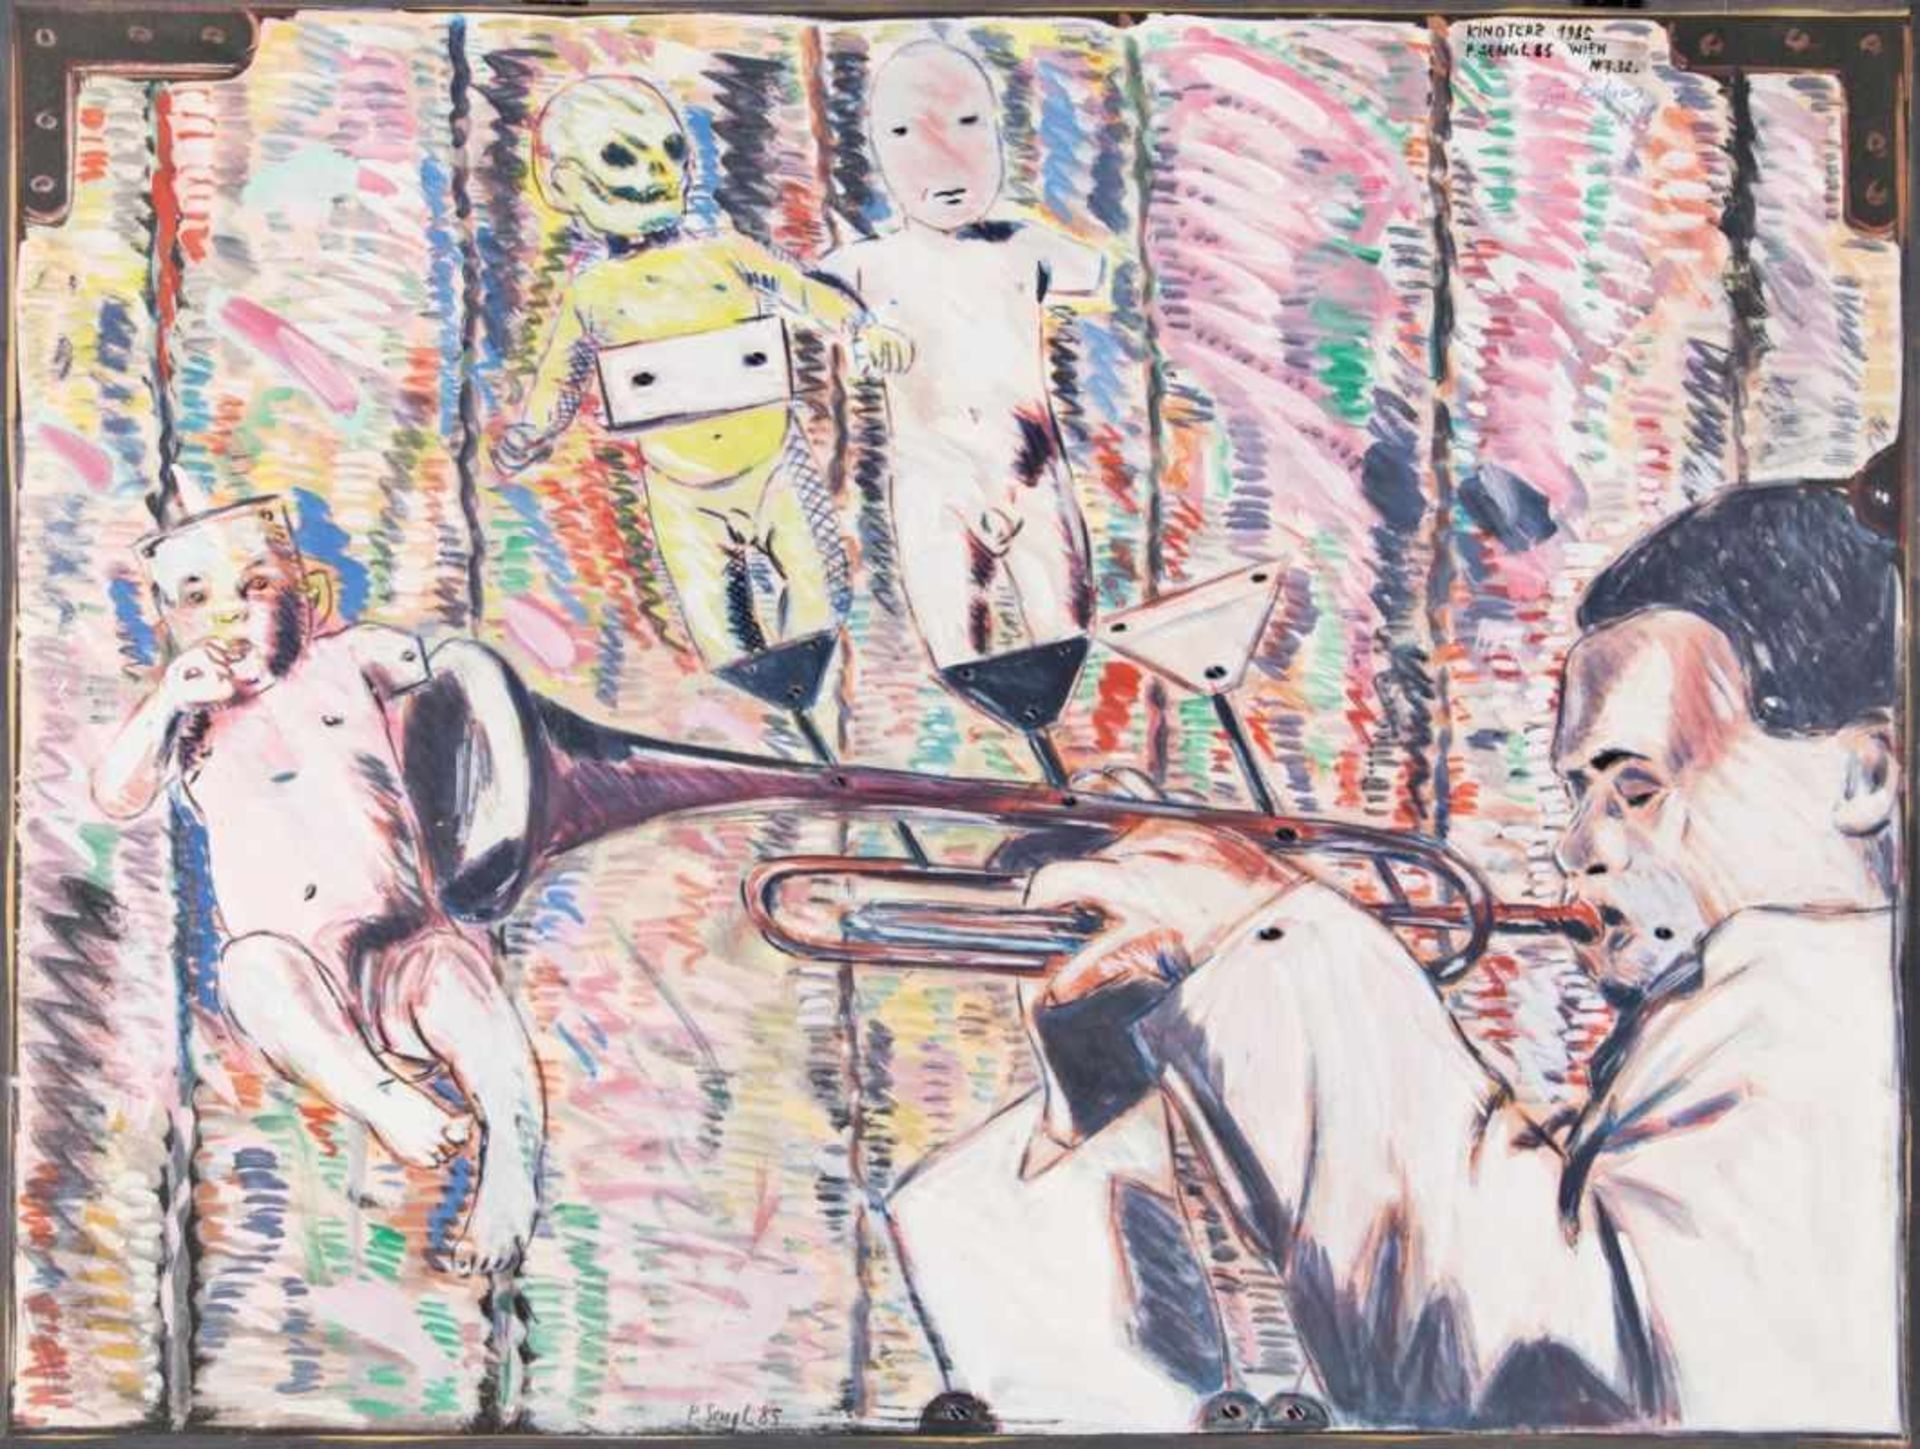 PETER SENGL(1945 UNTERBERGLA)KINDTERZ, 1985Mischtechnik, Acryl auf Papier, 49 x 64